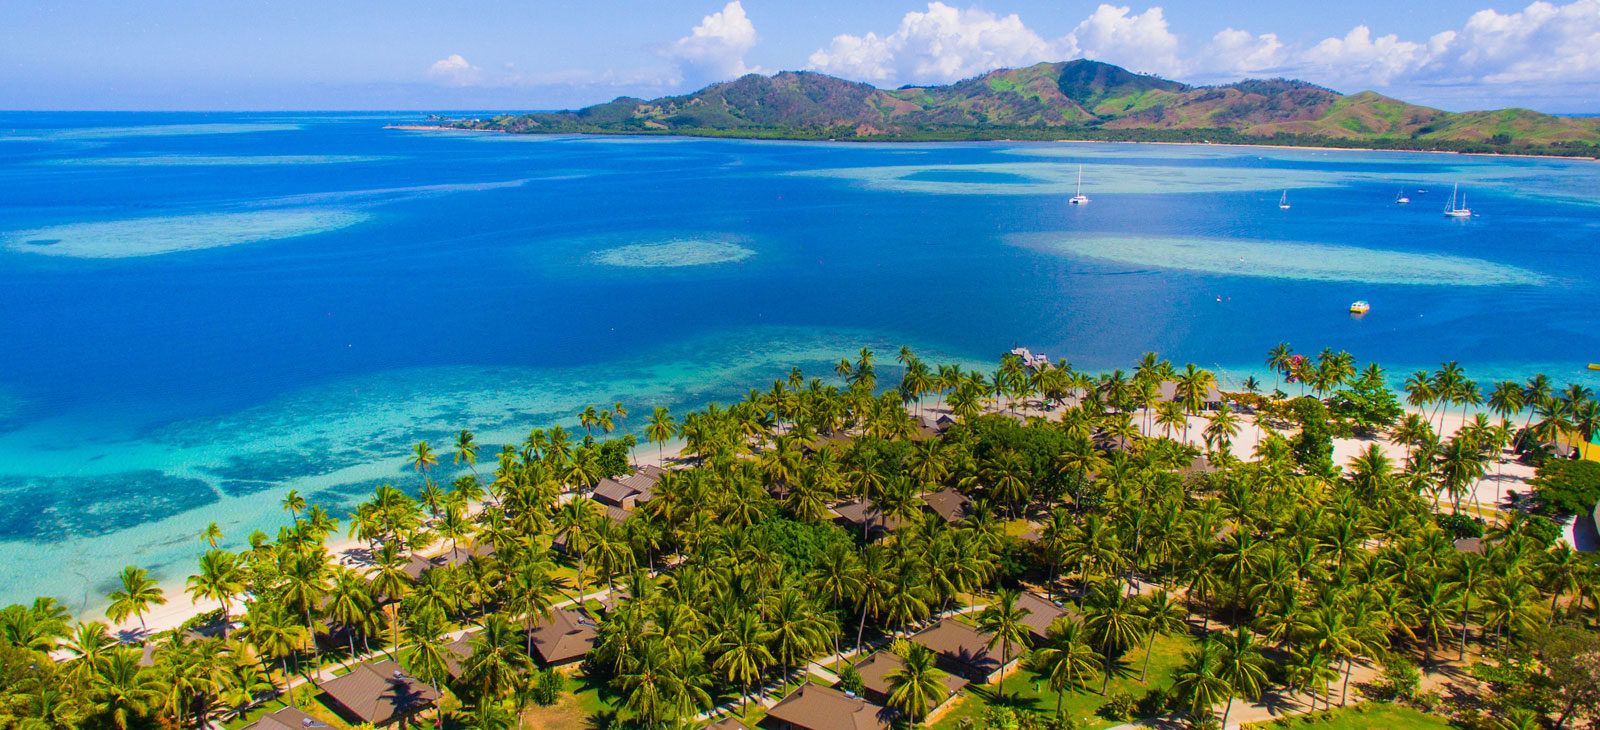 Plantation Resort, Fiji